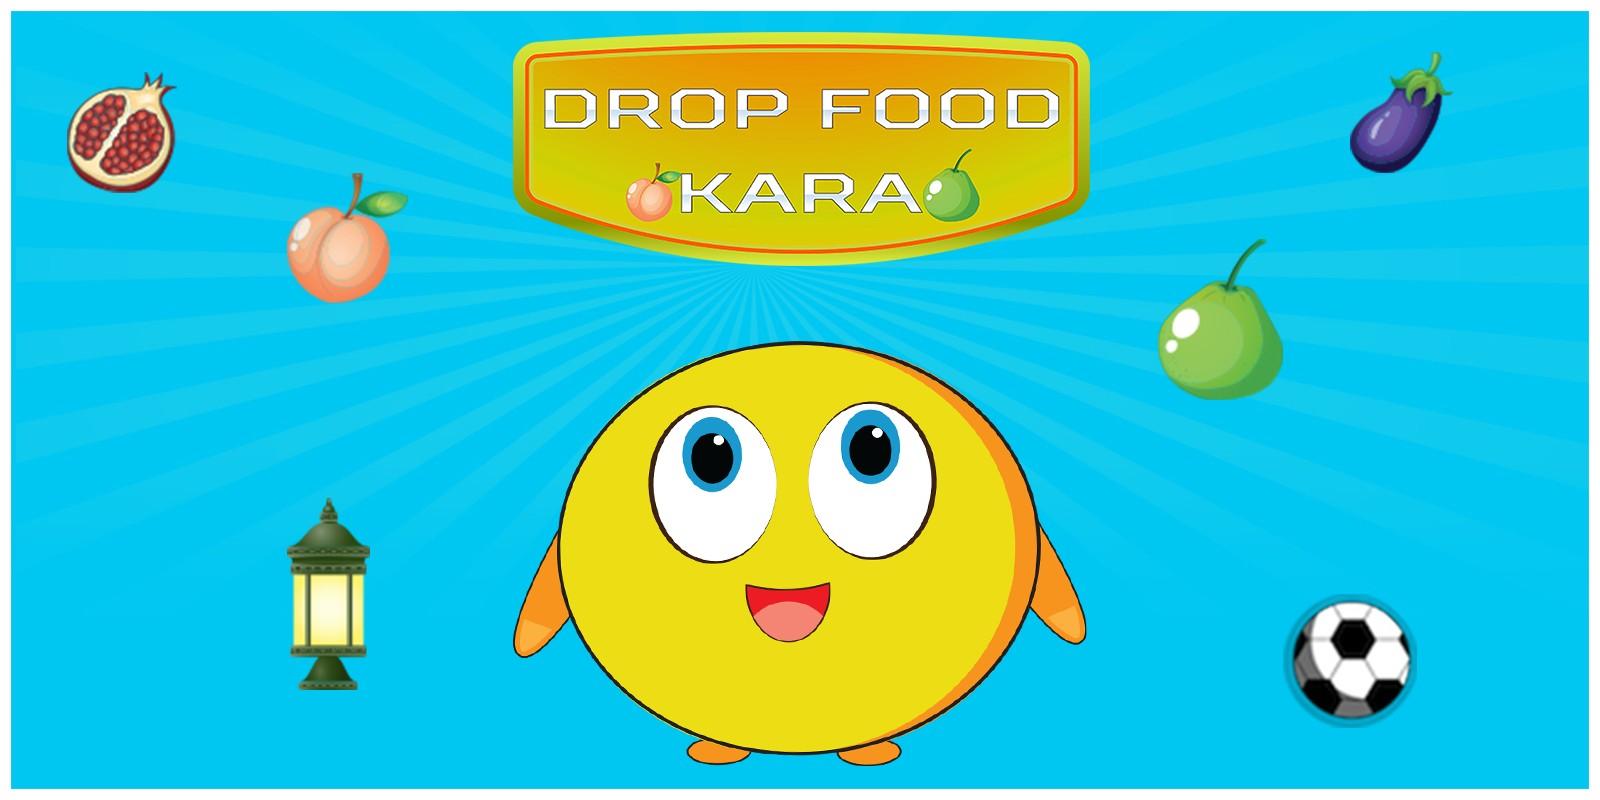 KARA Food Drop - Unity Game Source Code